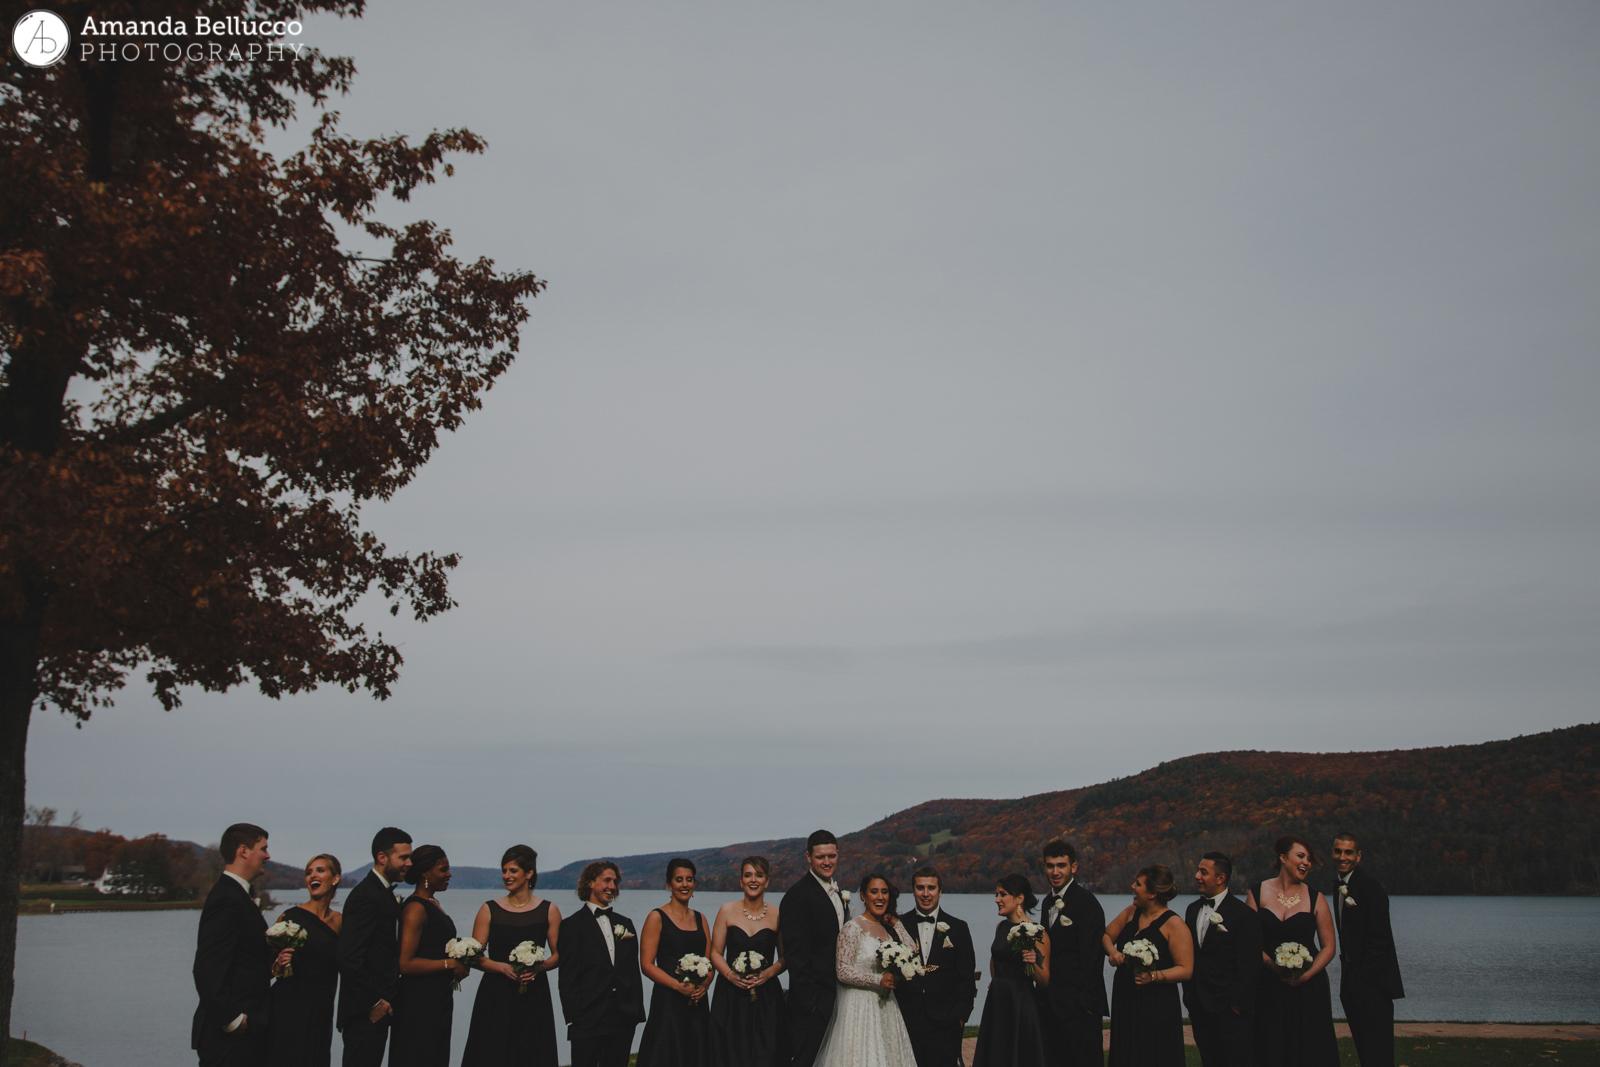 syracuse-rochester-fine-art-wedding-photographer-69.JPG